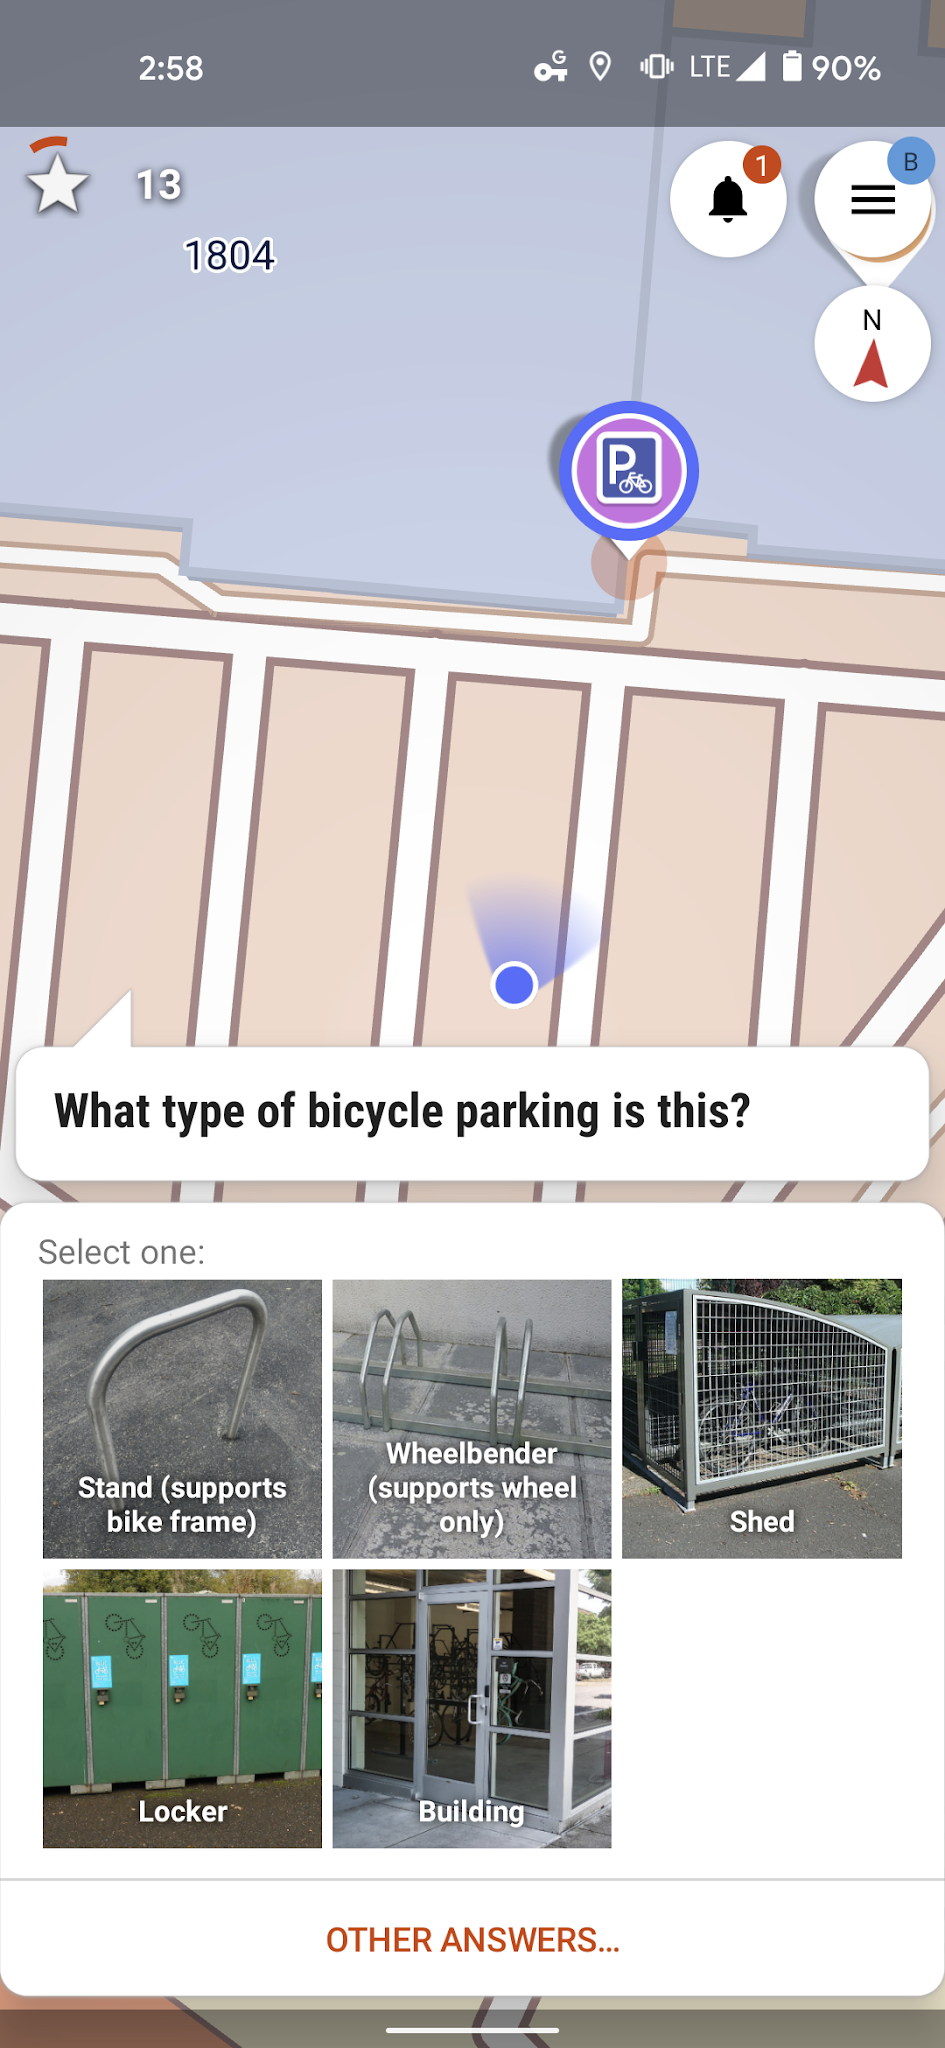 Bicycle parking type